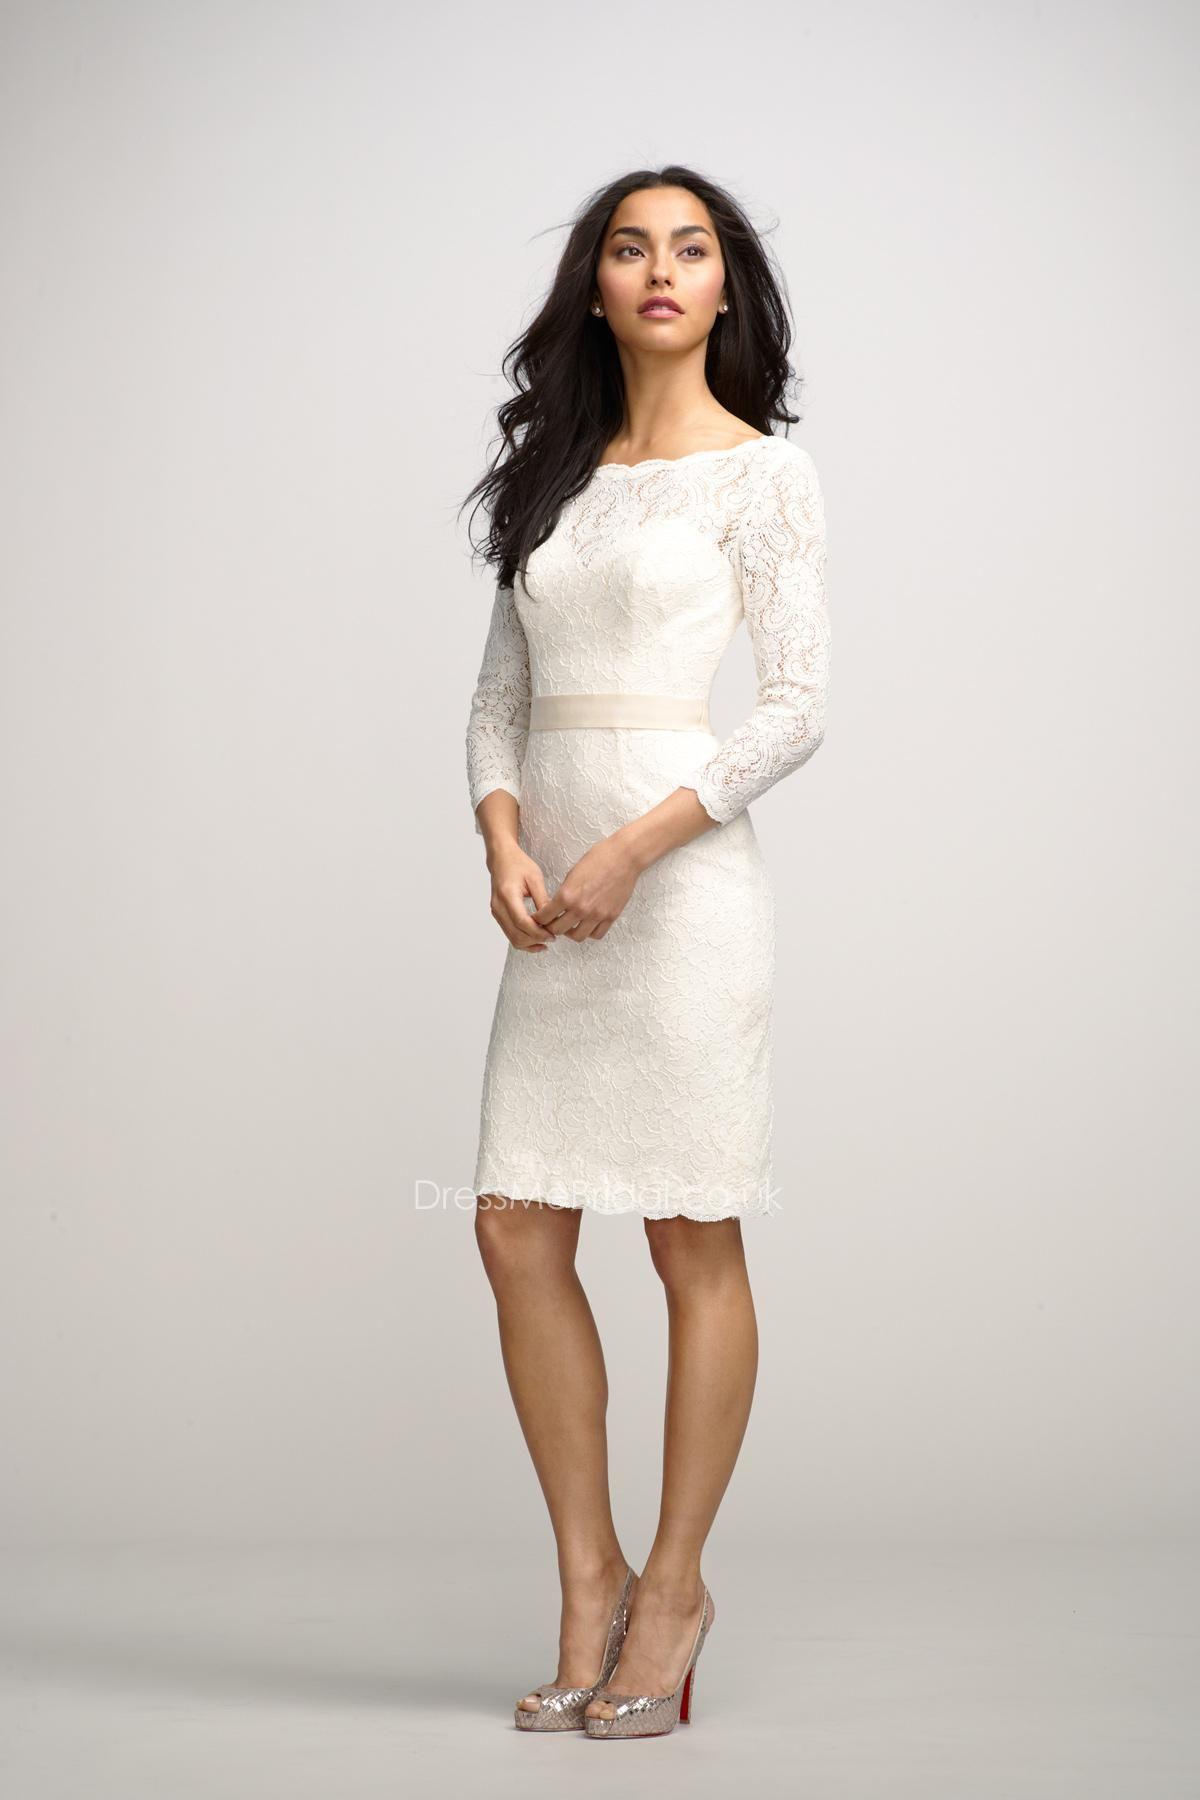 Sheath short bateau neck little white lace designer bridesmaid dress